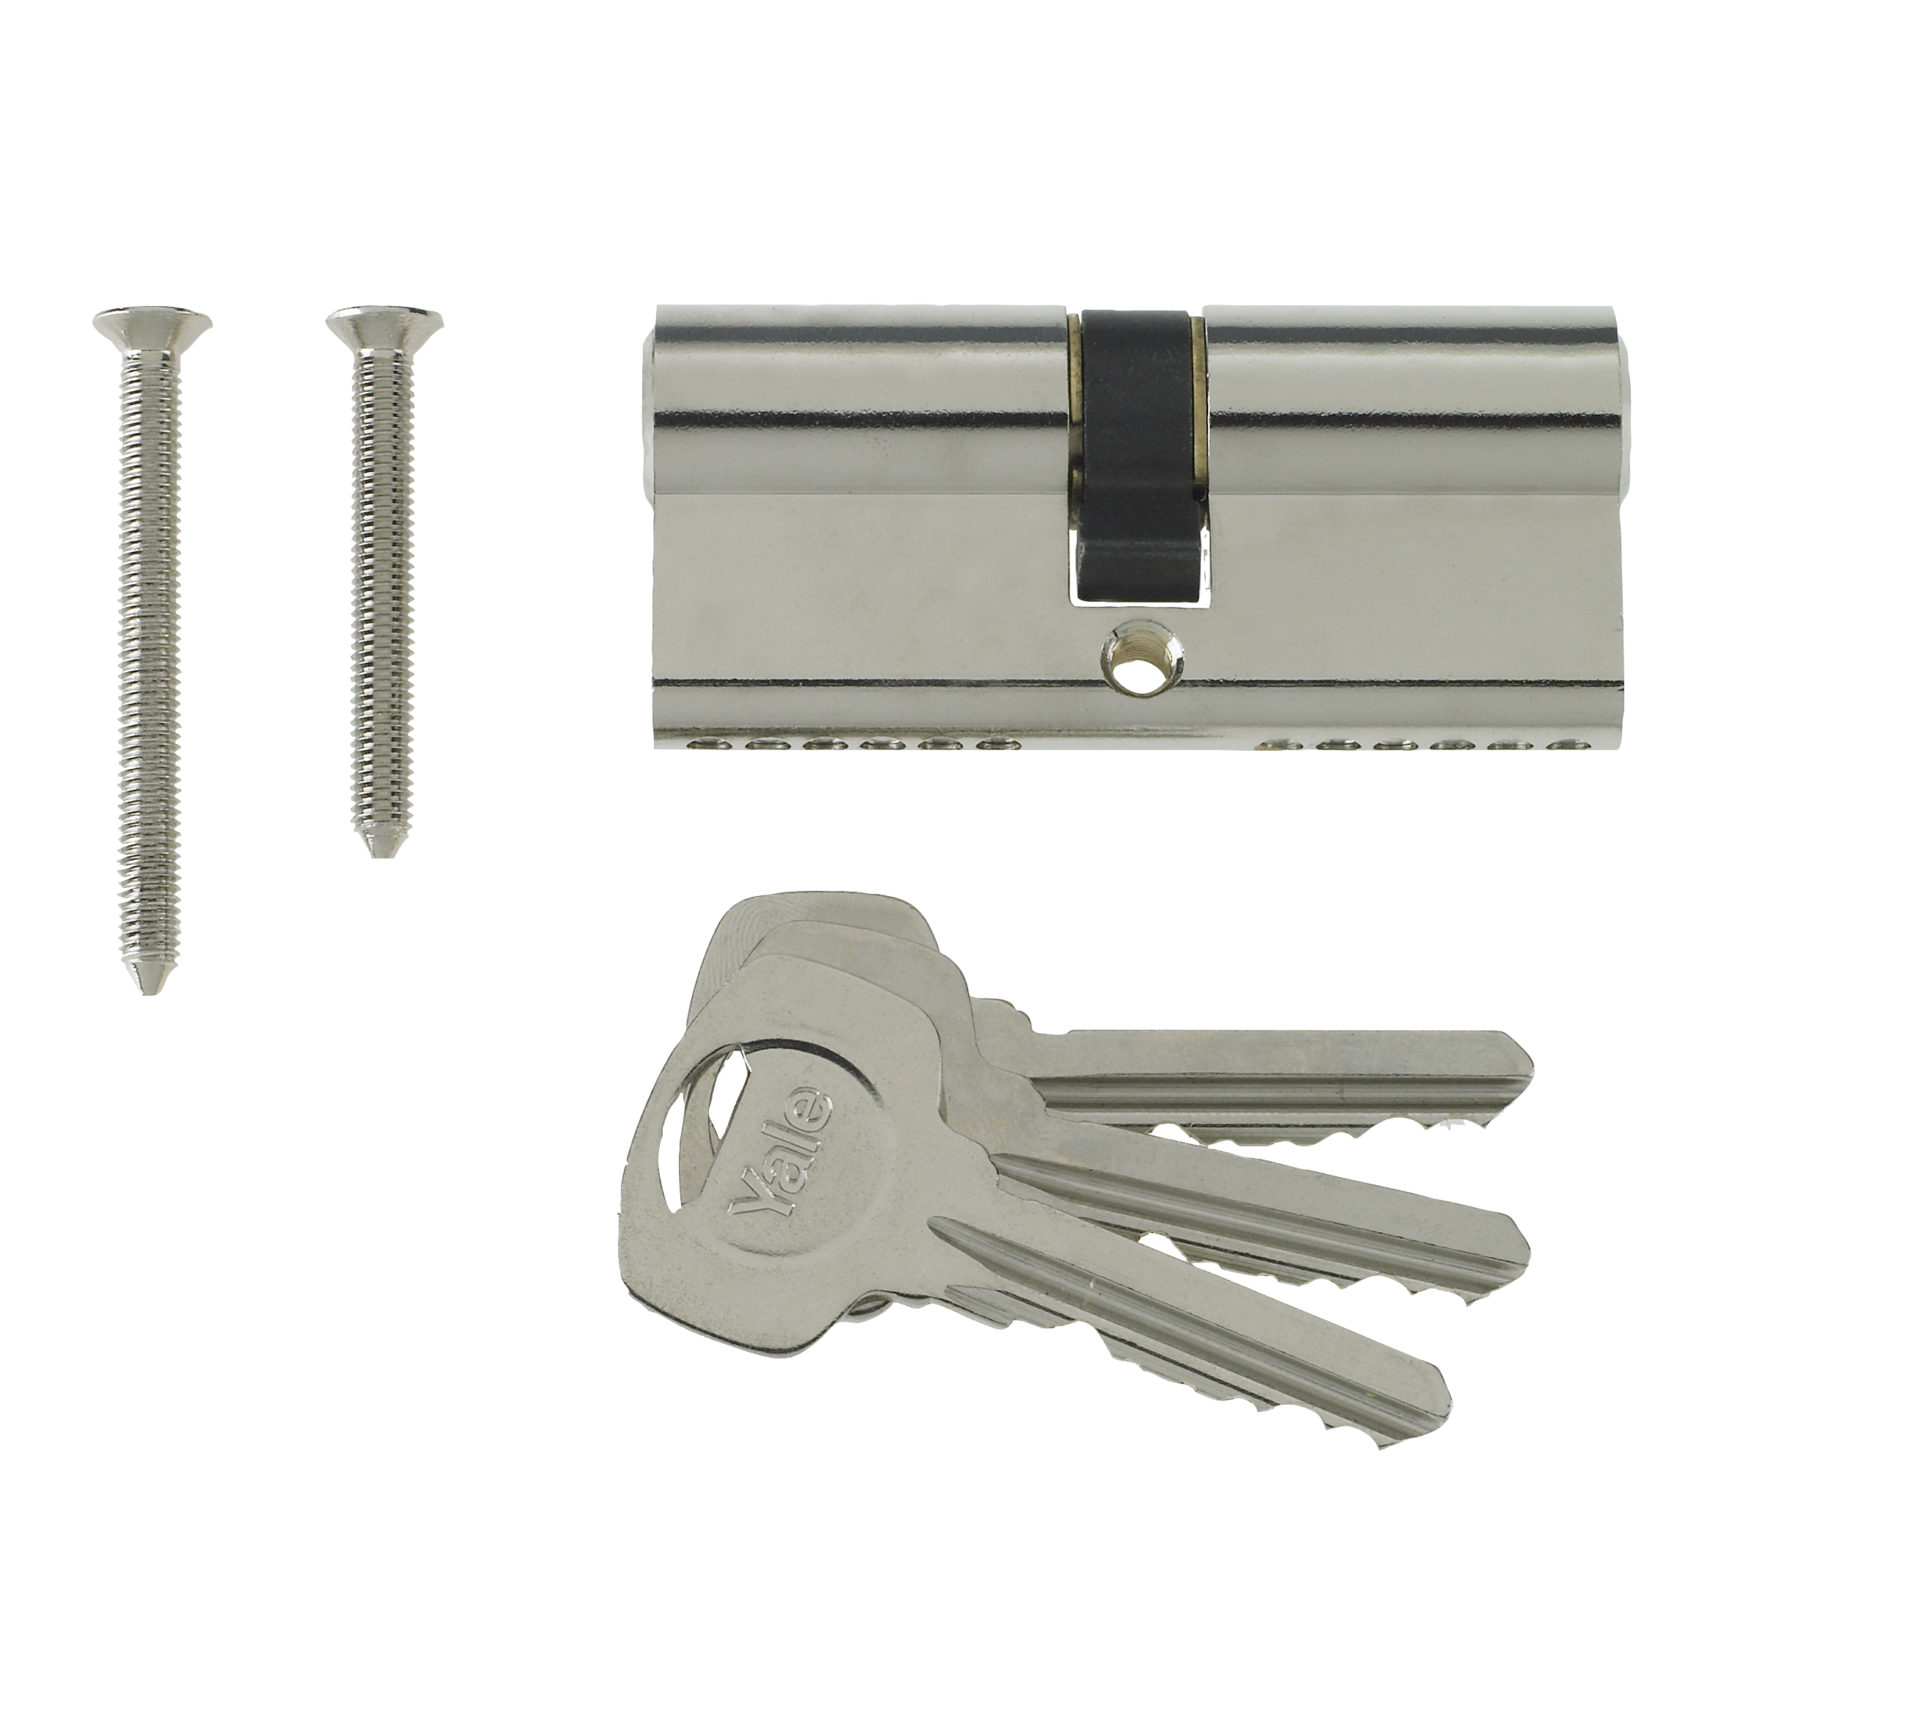 Yale 6 Pin Euro Profile Cylinder Lock Nickle 40/45 (85mm) C/w 3 Keys